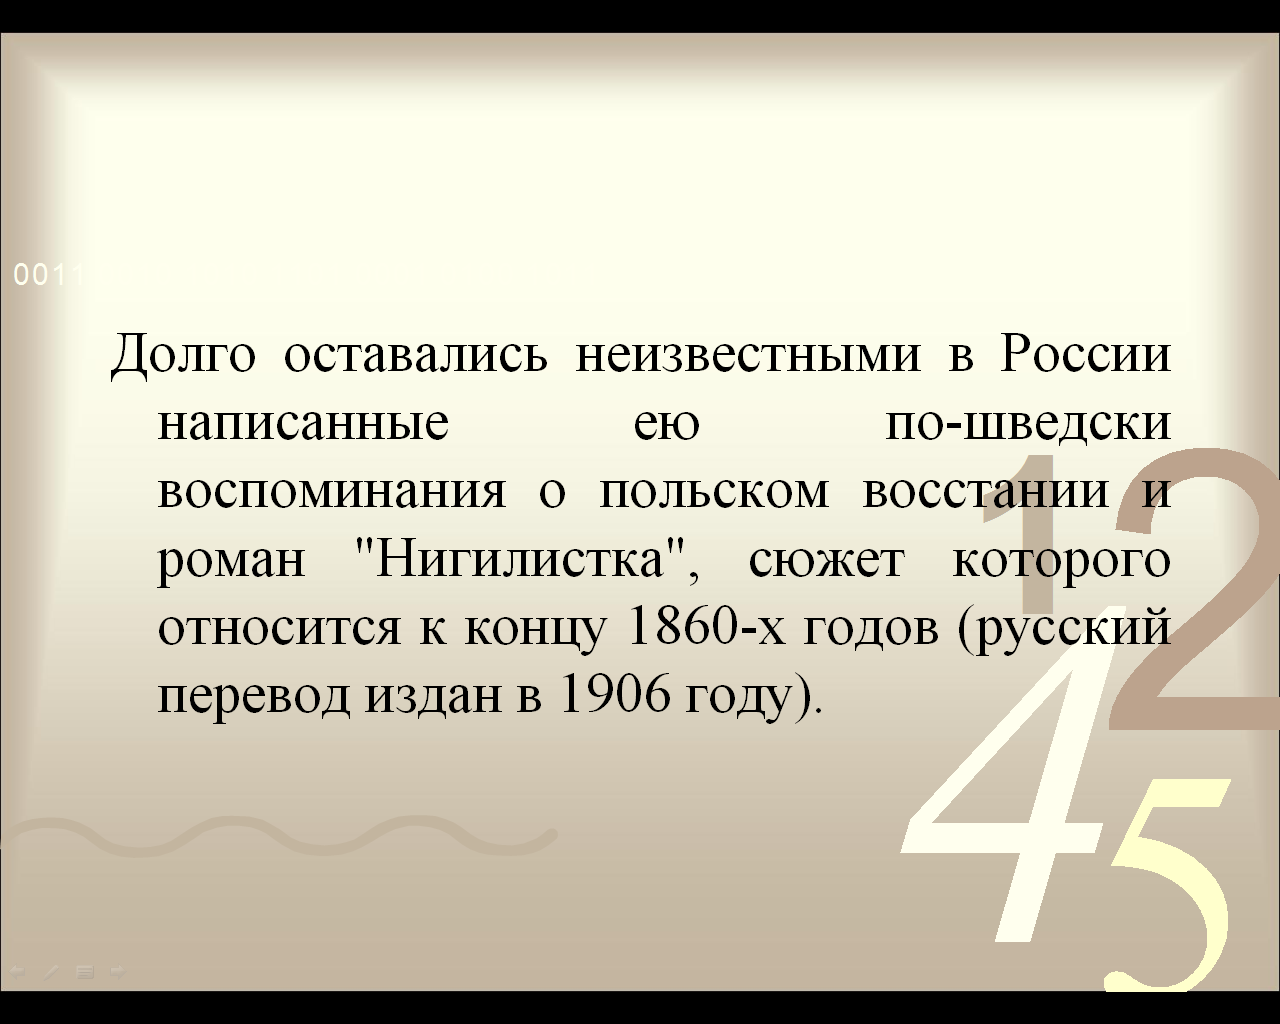 C:\Users\Grigoriy\Desktop\конкурс\слайды\13.png